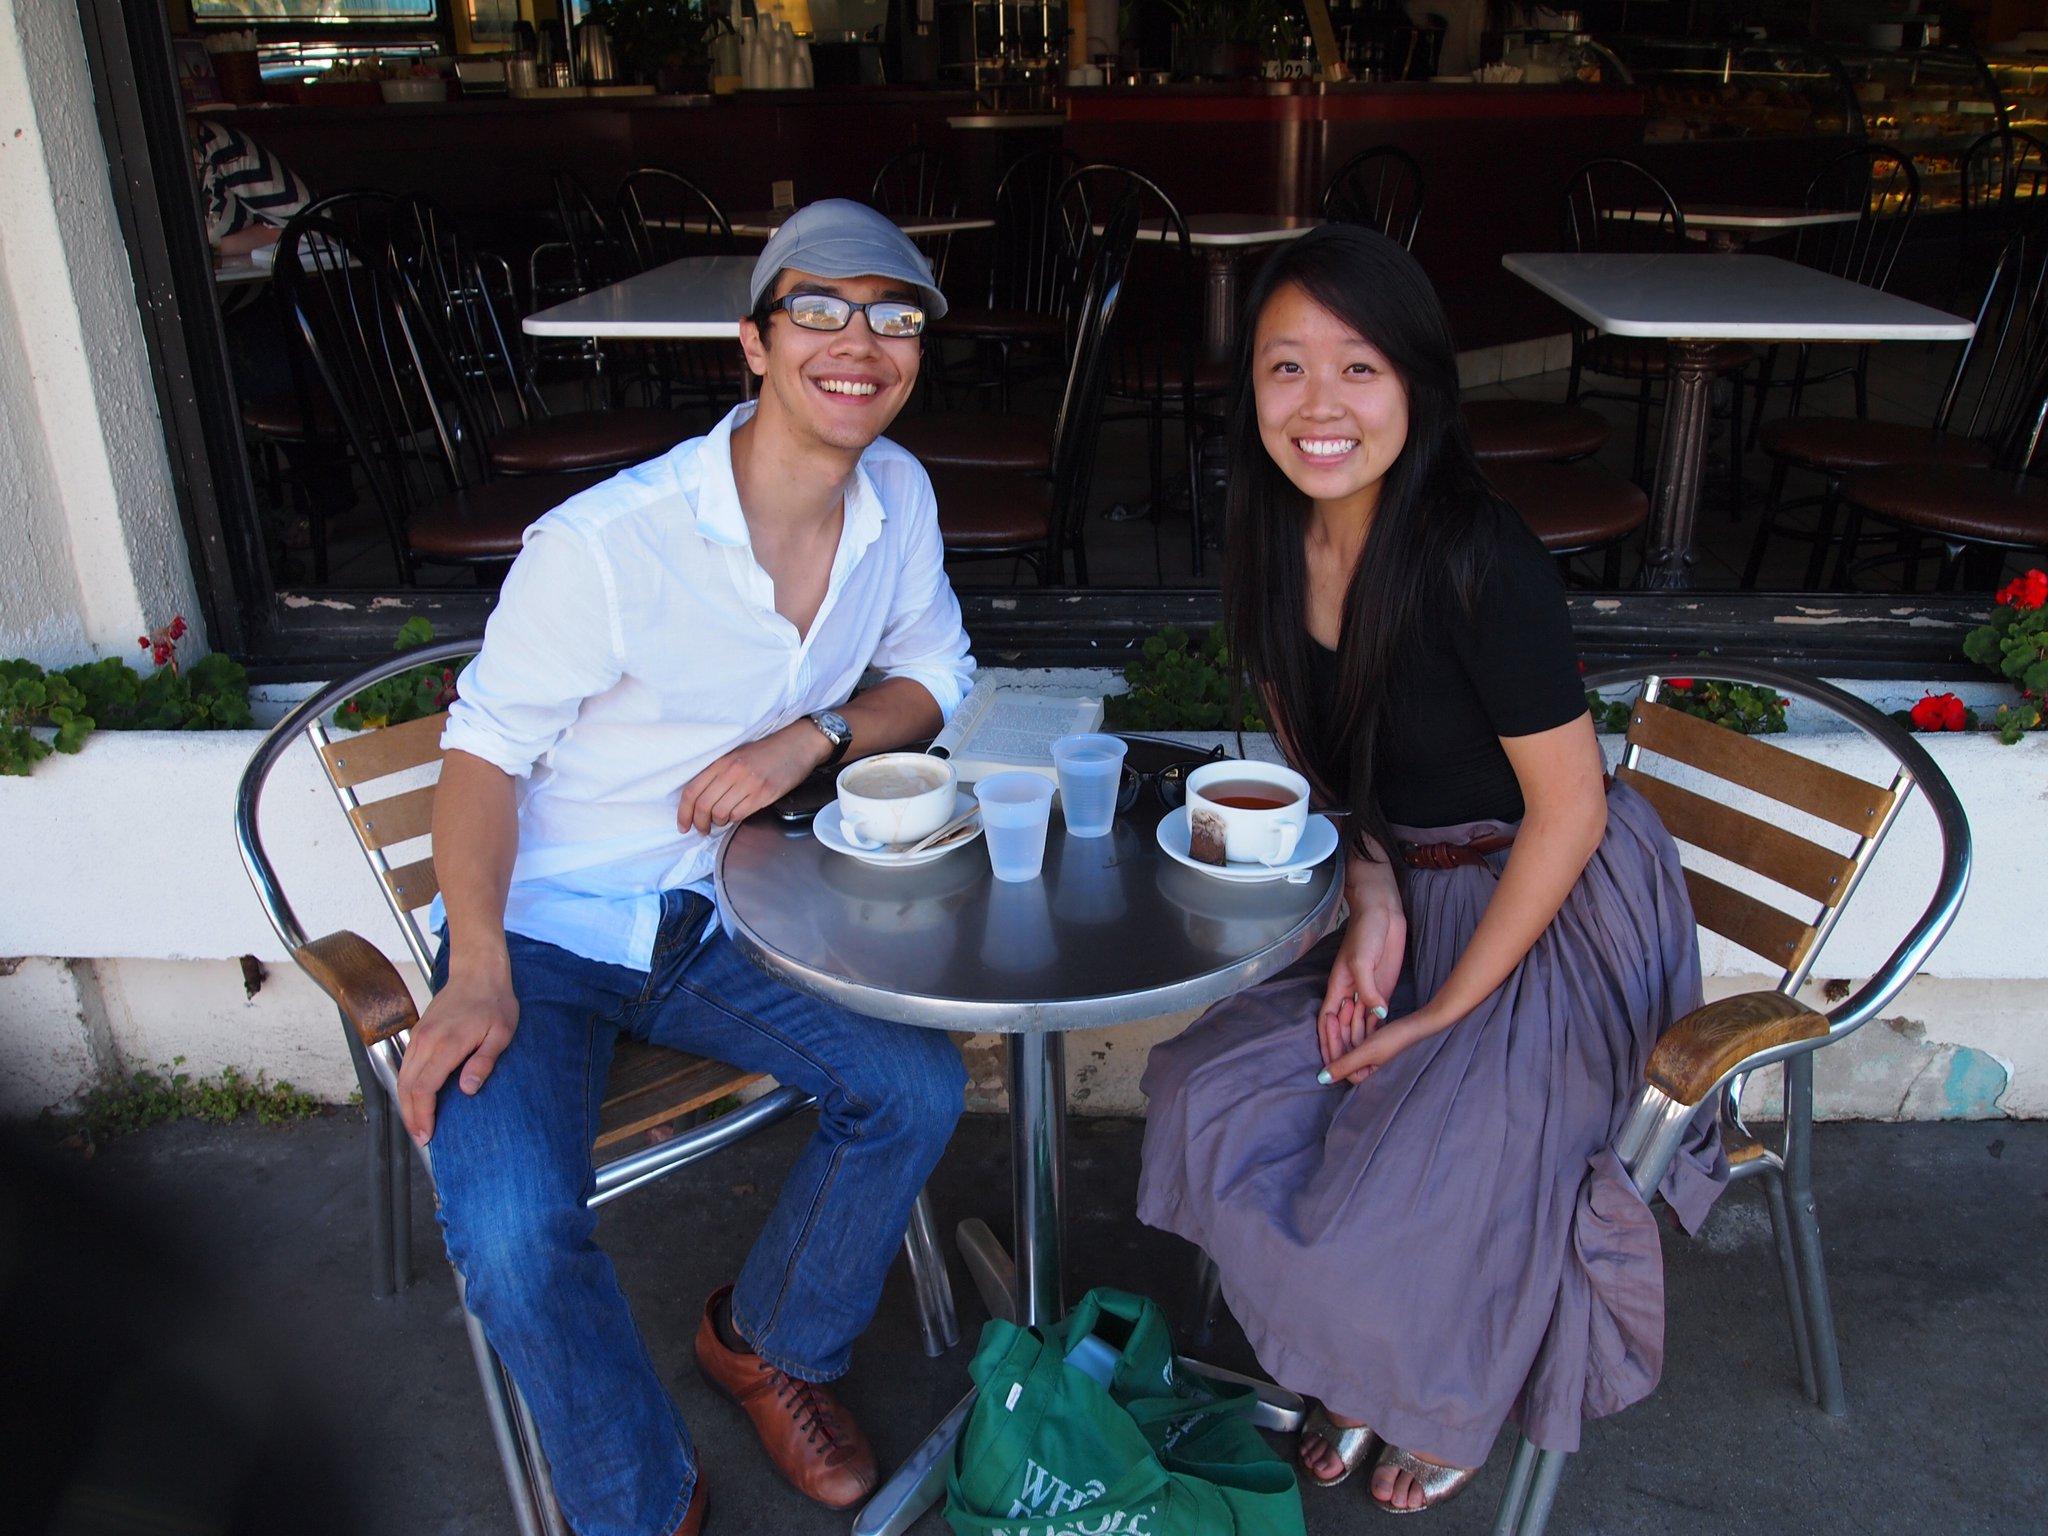 Coffee and tea at UCLA, 2011